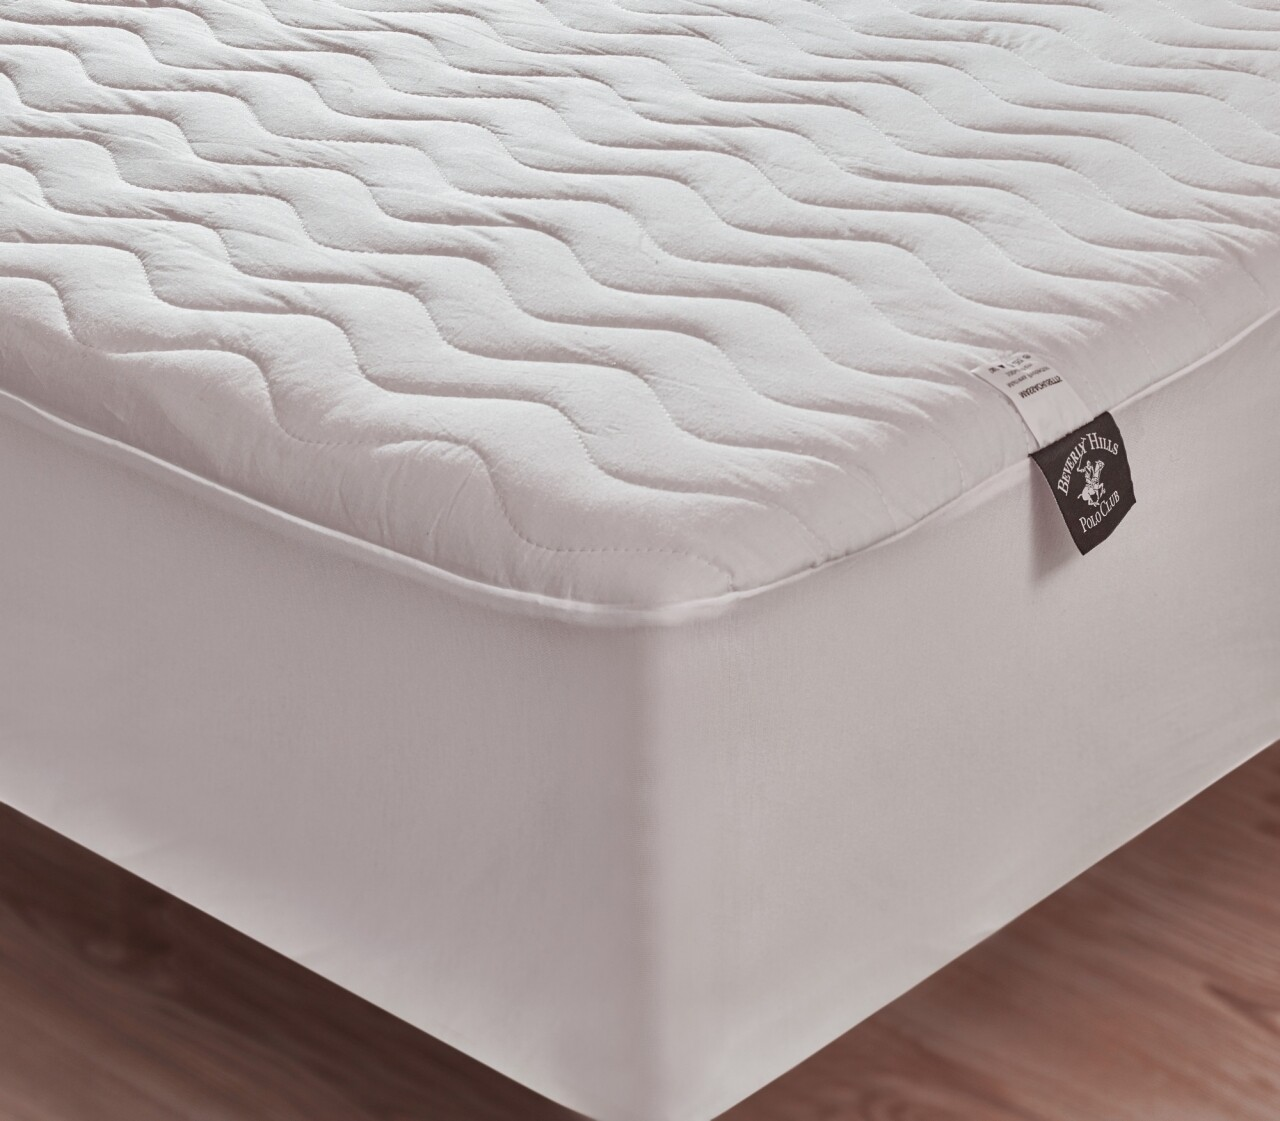 Husa protectie de pat dublu, 180x200 cm, 100% bumbac, Beverly Hills Polo Club, White